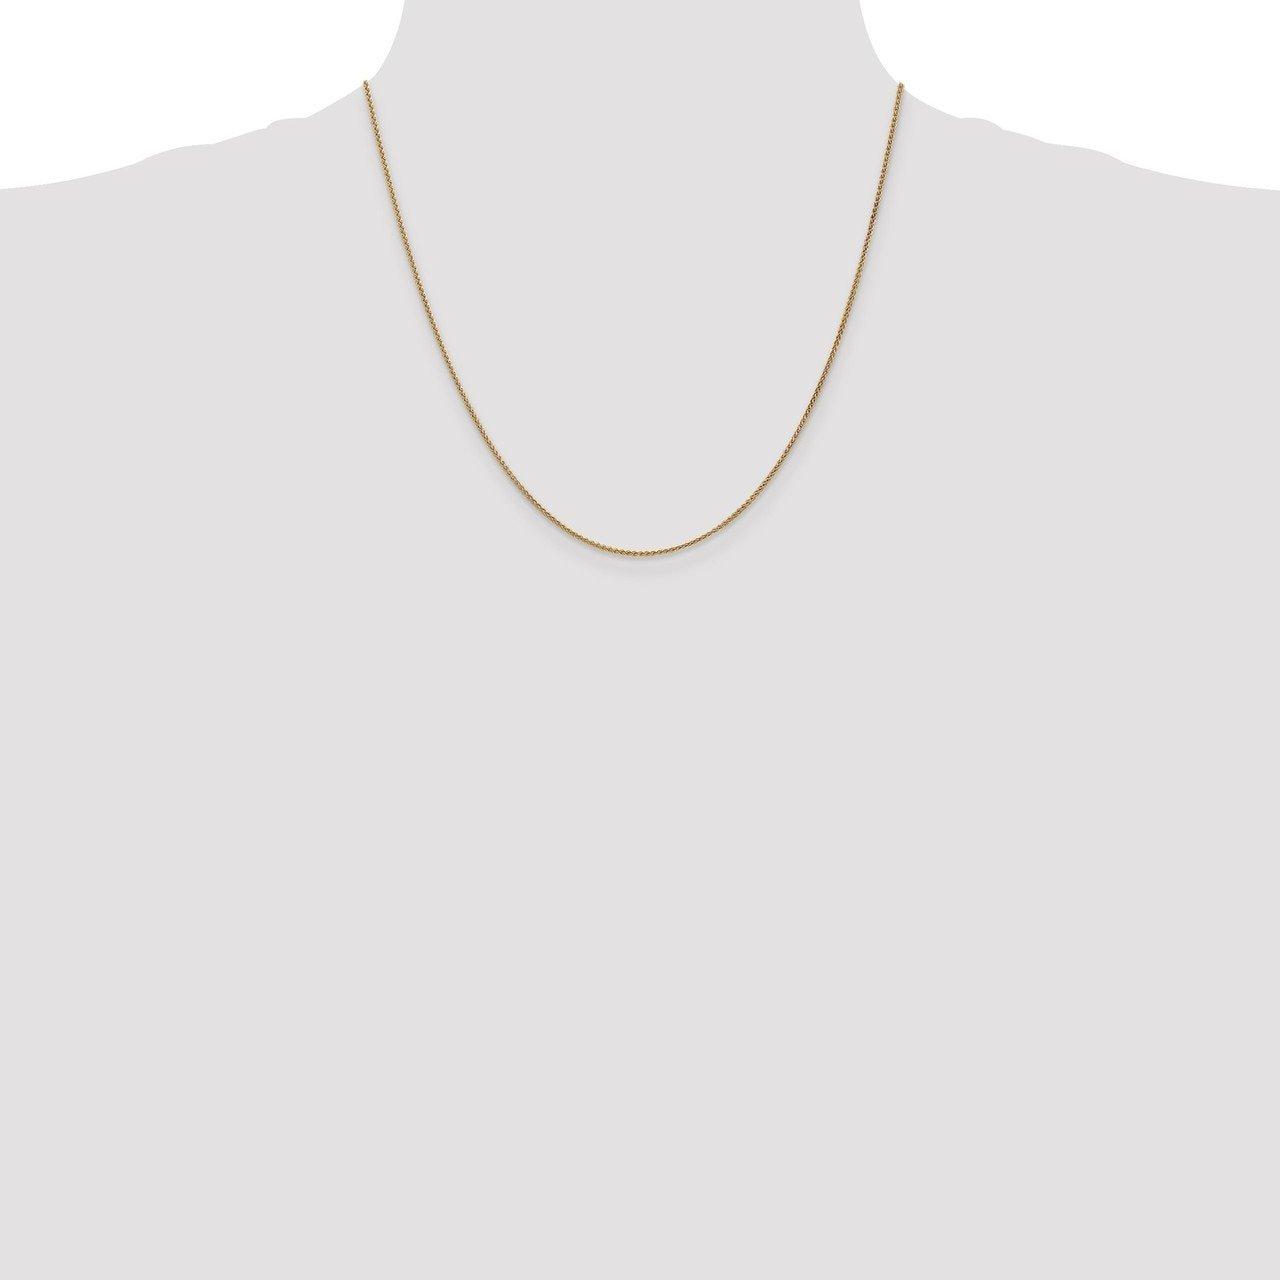 Bracelet or Necklace Lex /& Lu 10k Yellow Gold 1.25mm Spiga Chain Anklet